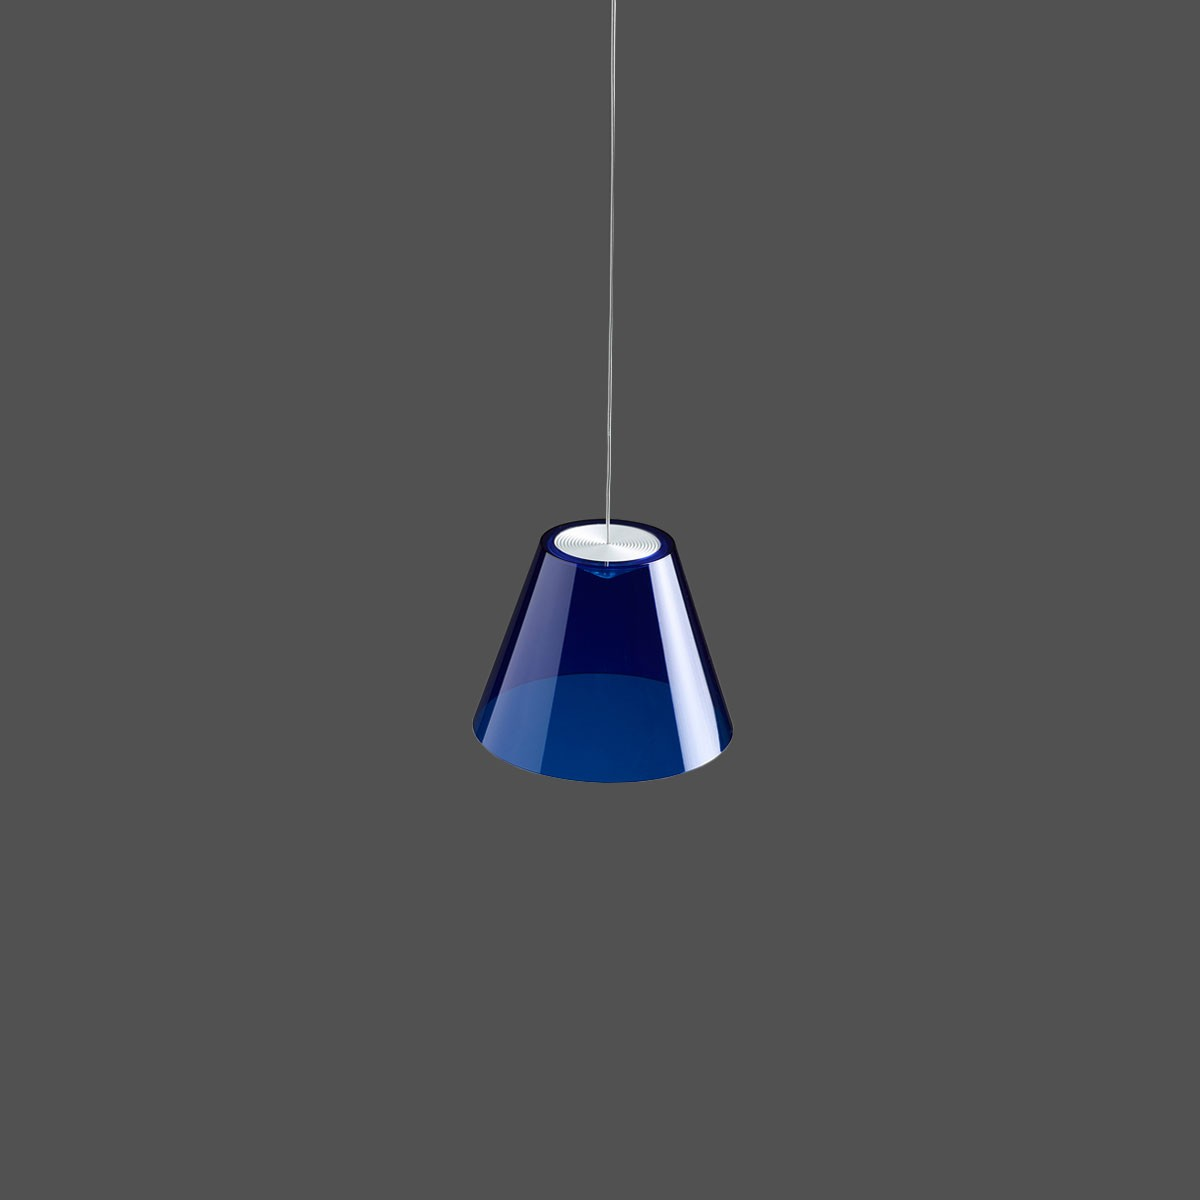 Rotaliana Dina H1 Pendelleuchte, blau